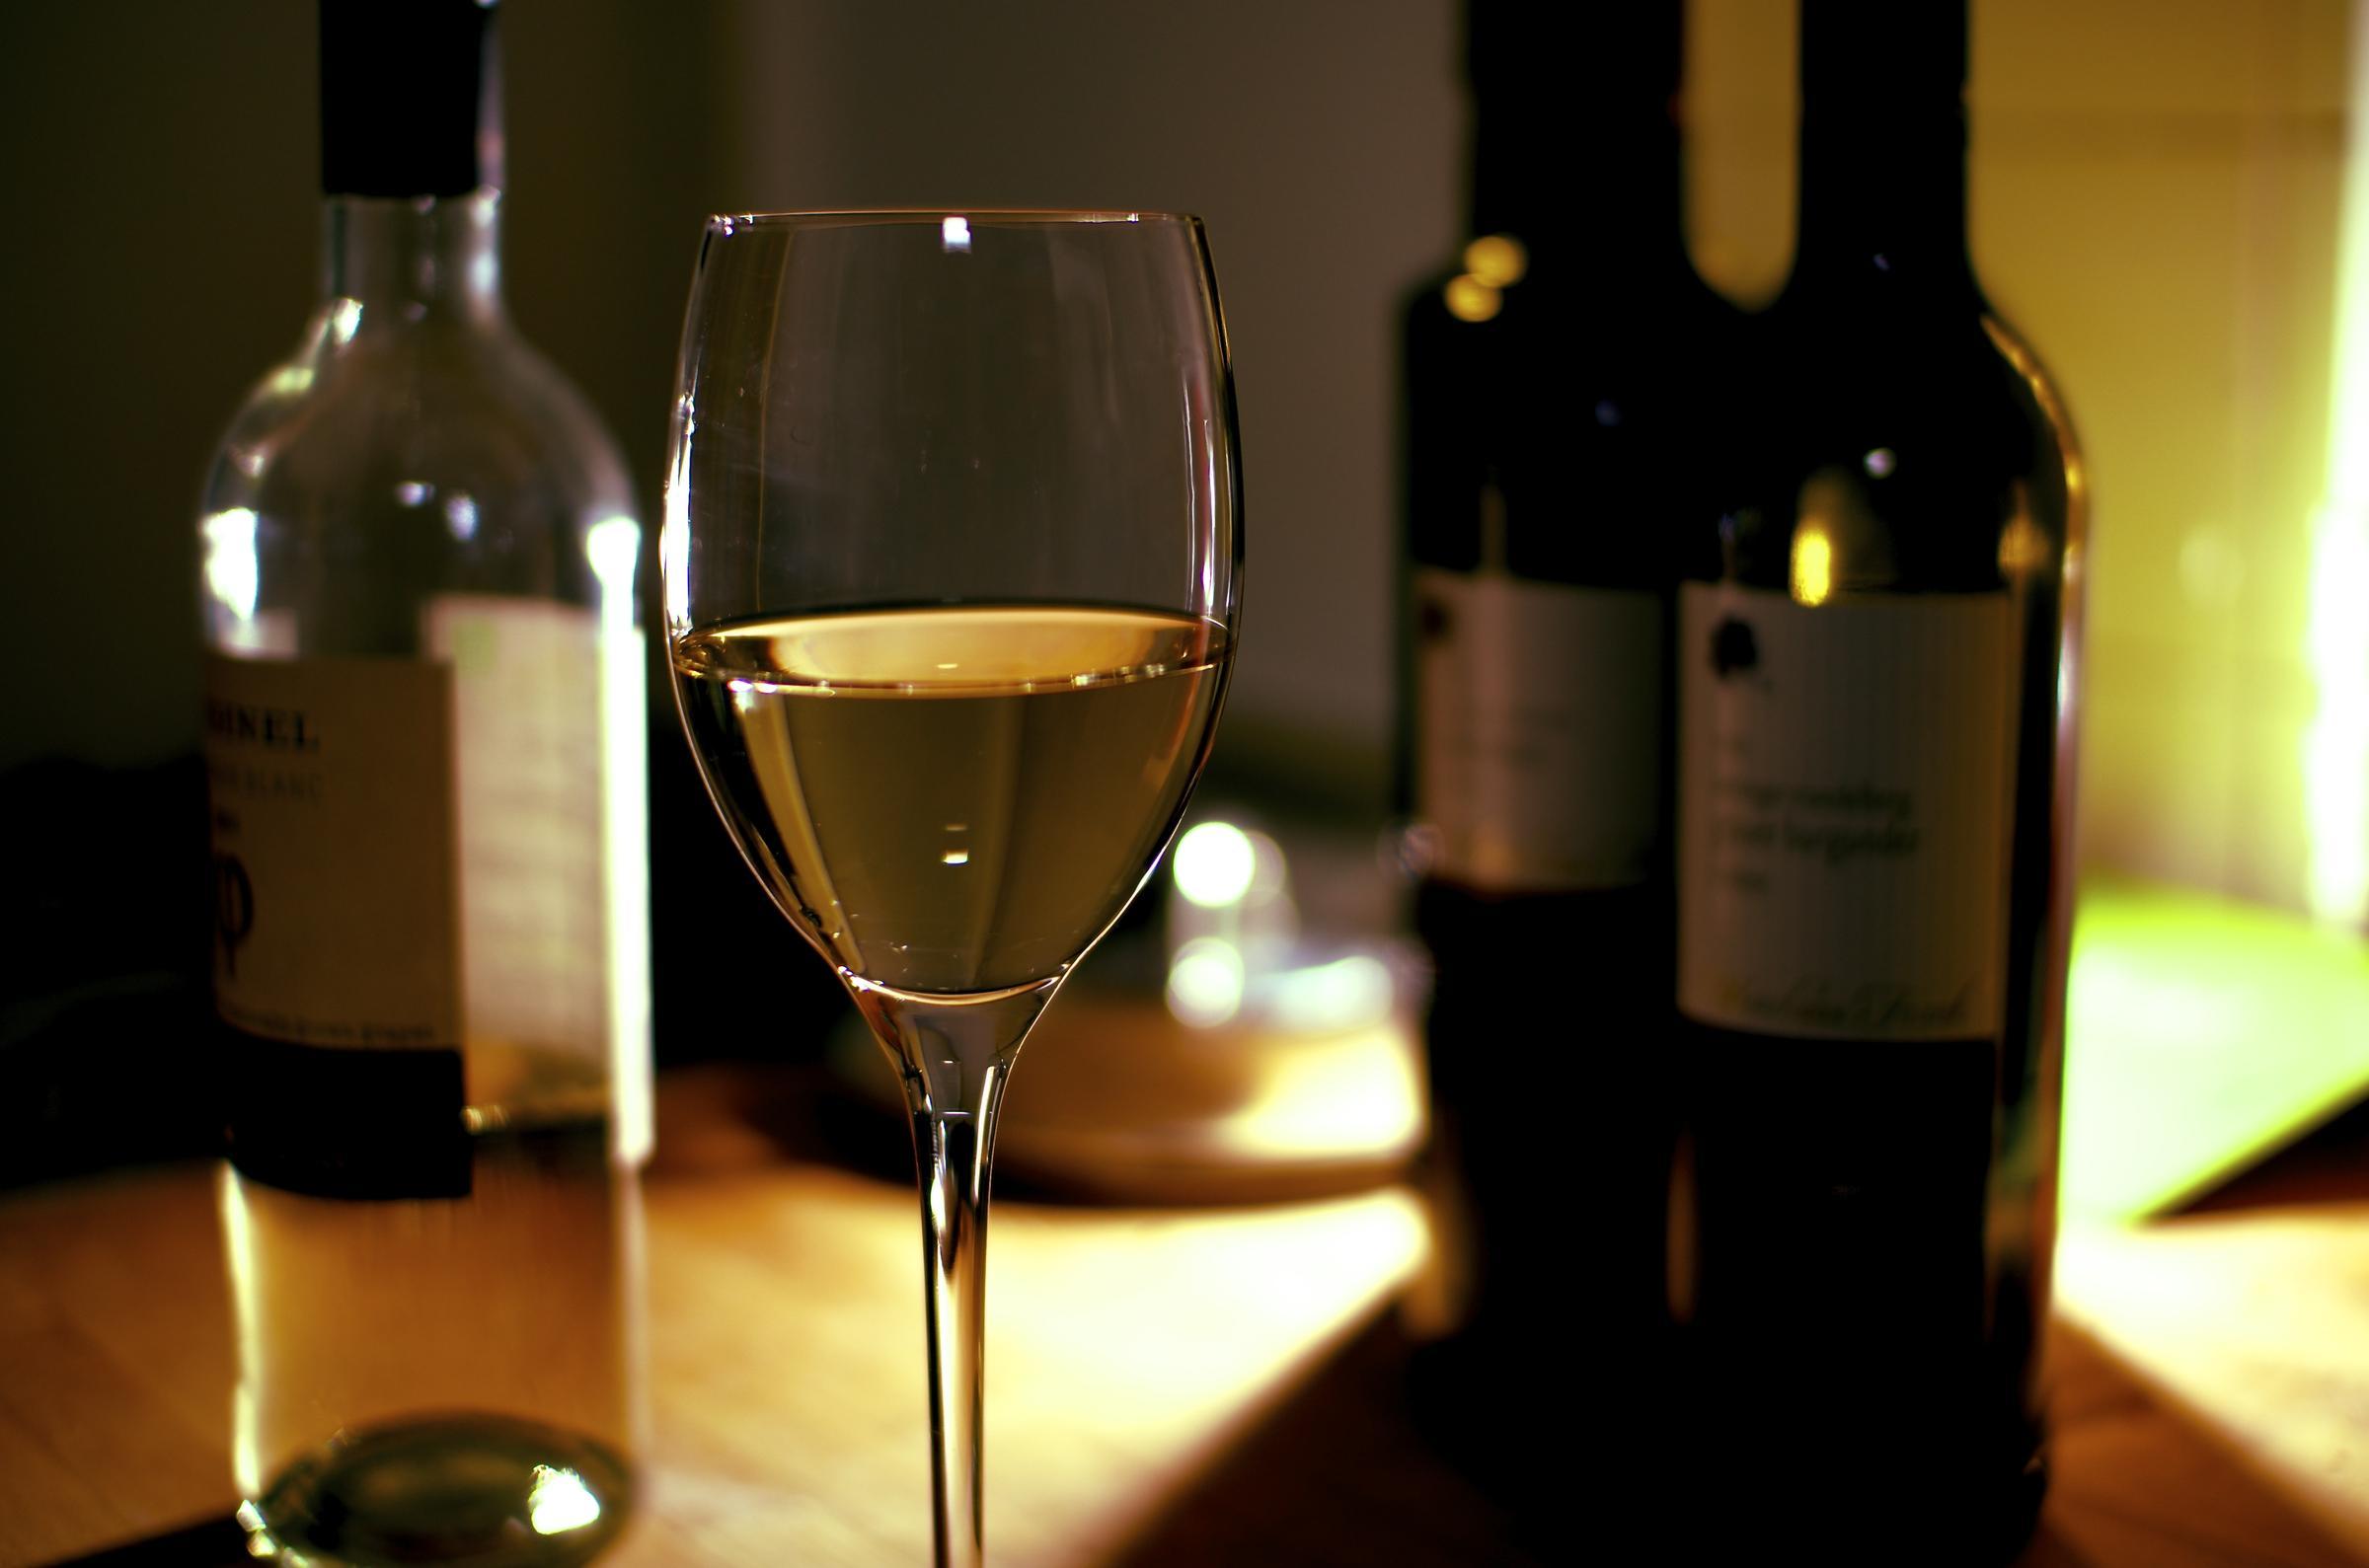 sauvignon blanc the summer wine wuwm